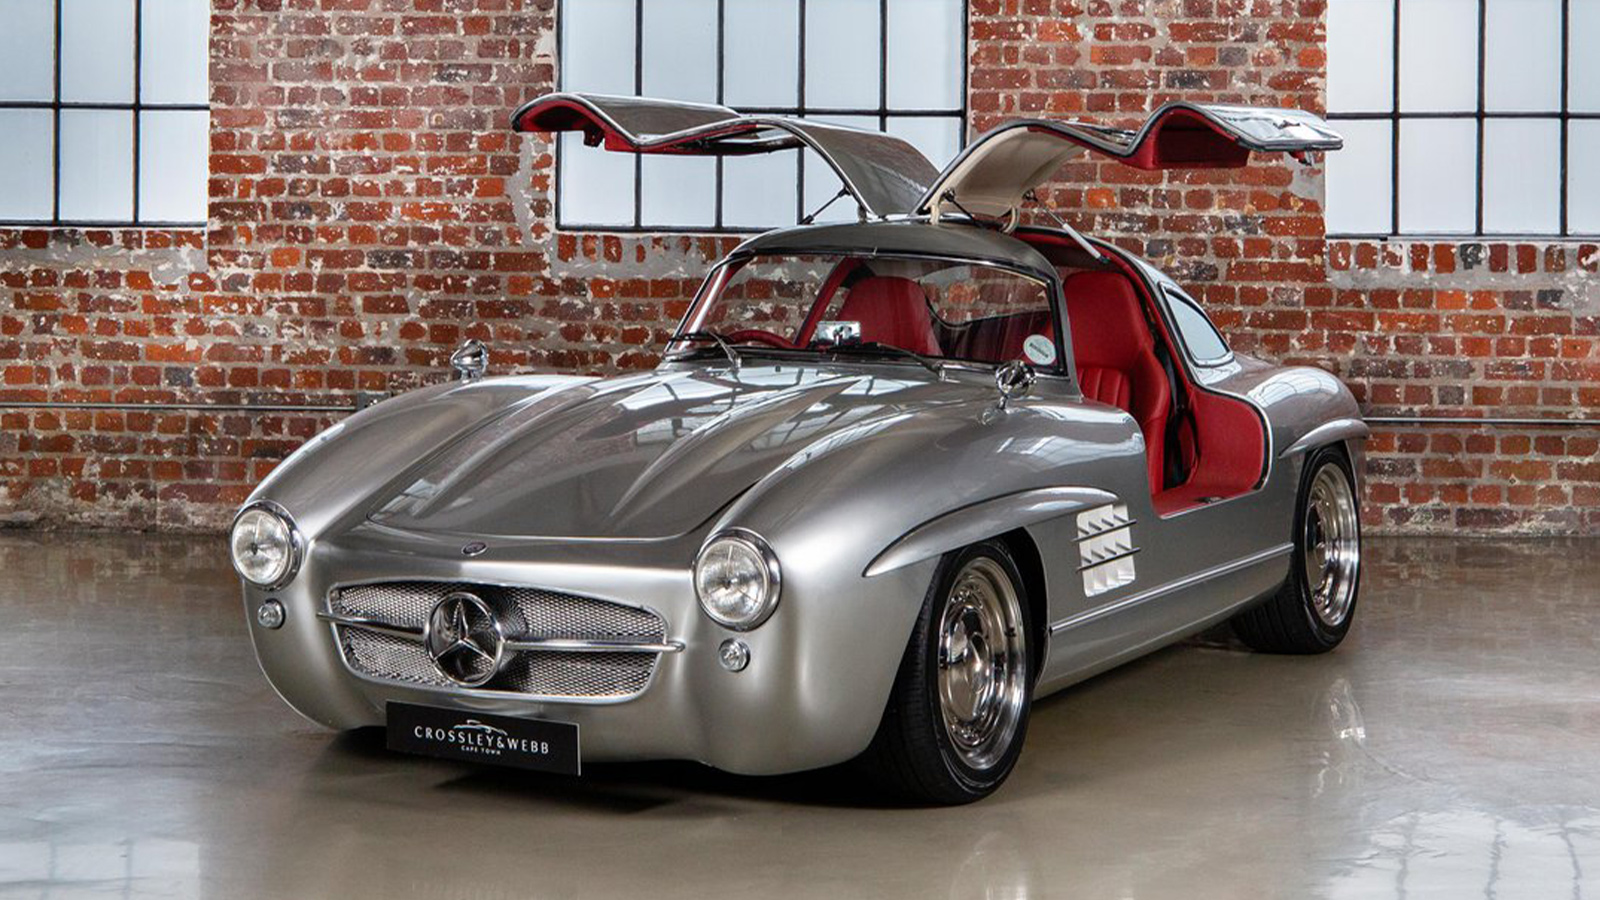 2001 Mercedes Benz SLK 32 AMG Gullwing Tribute